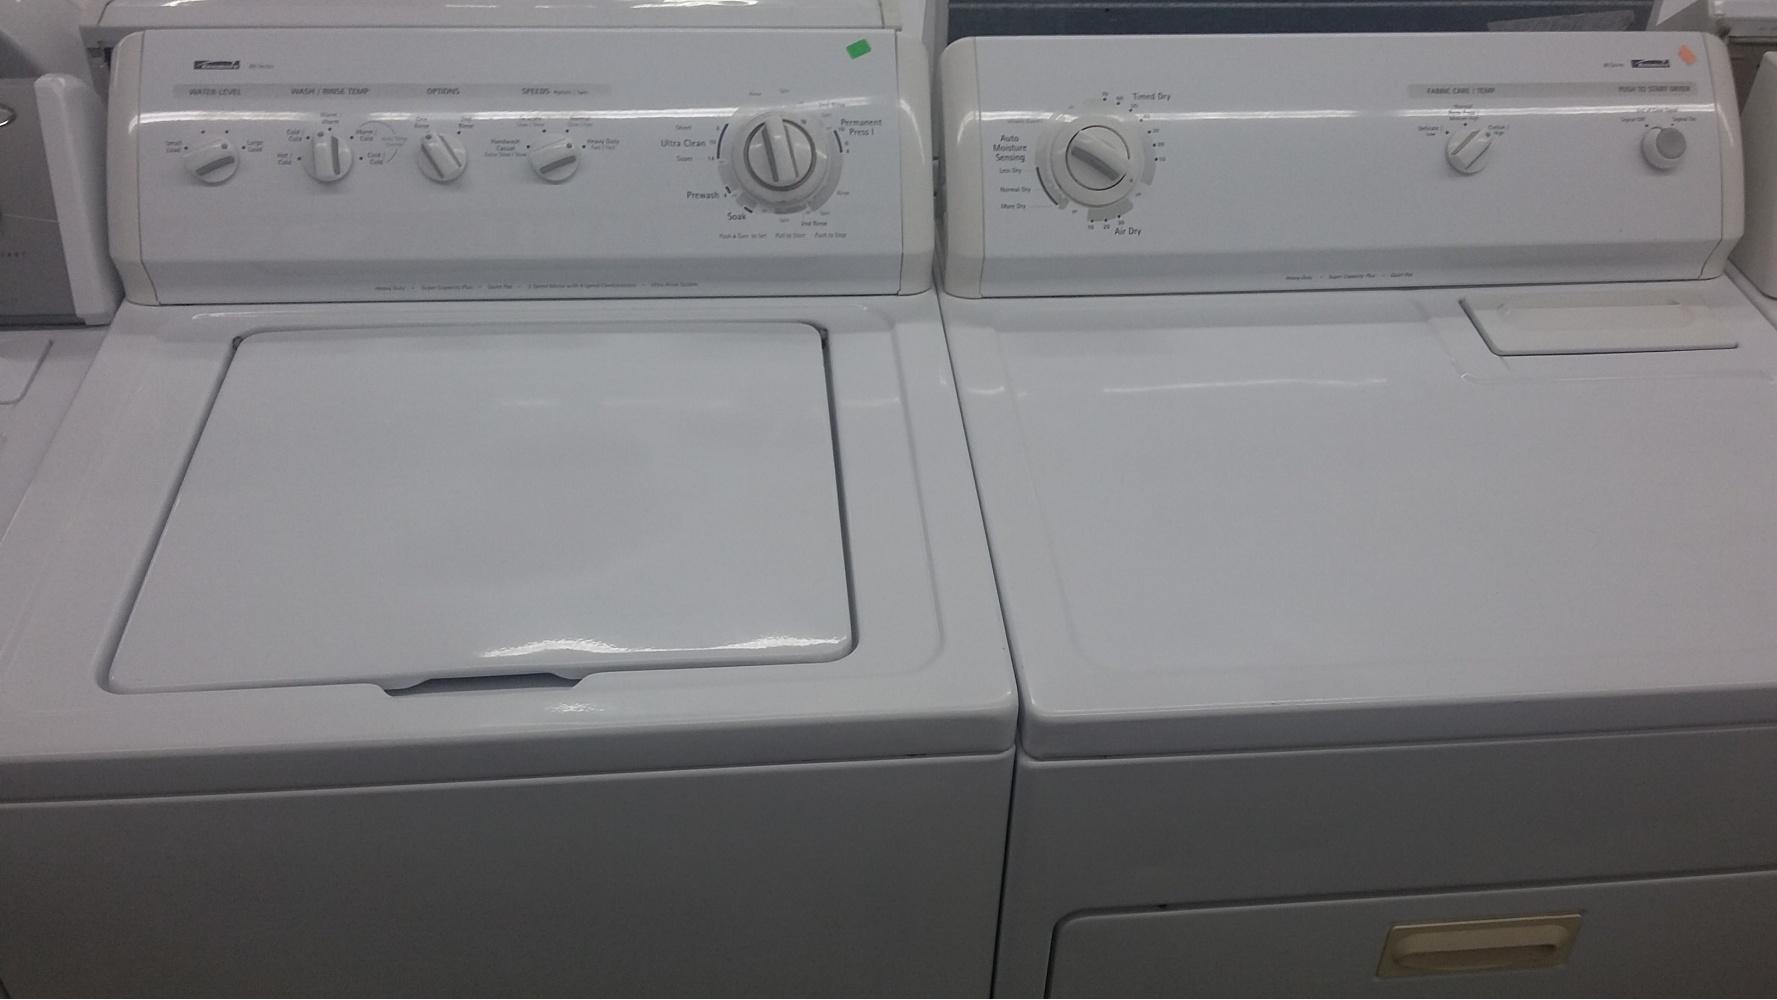 Kenmore 90 series dryer kenmore elite he3 washing machine for Kenmore washer